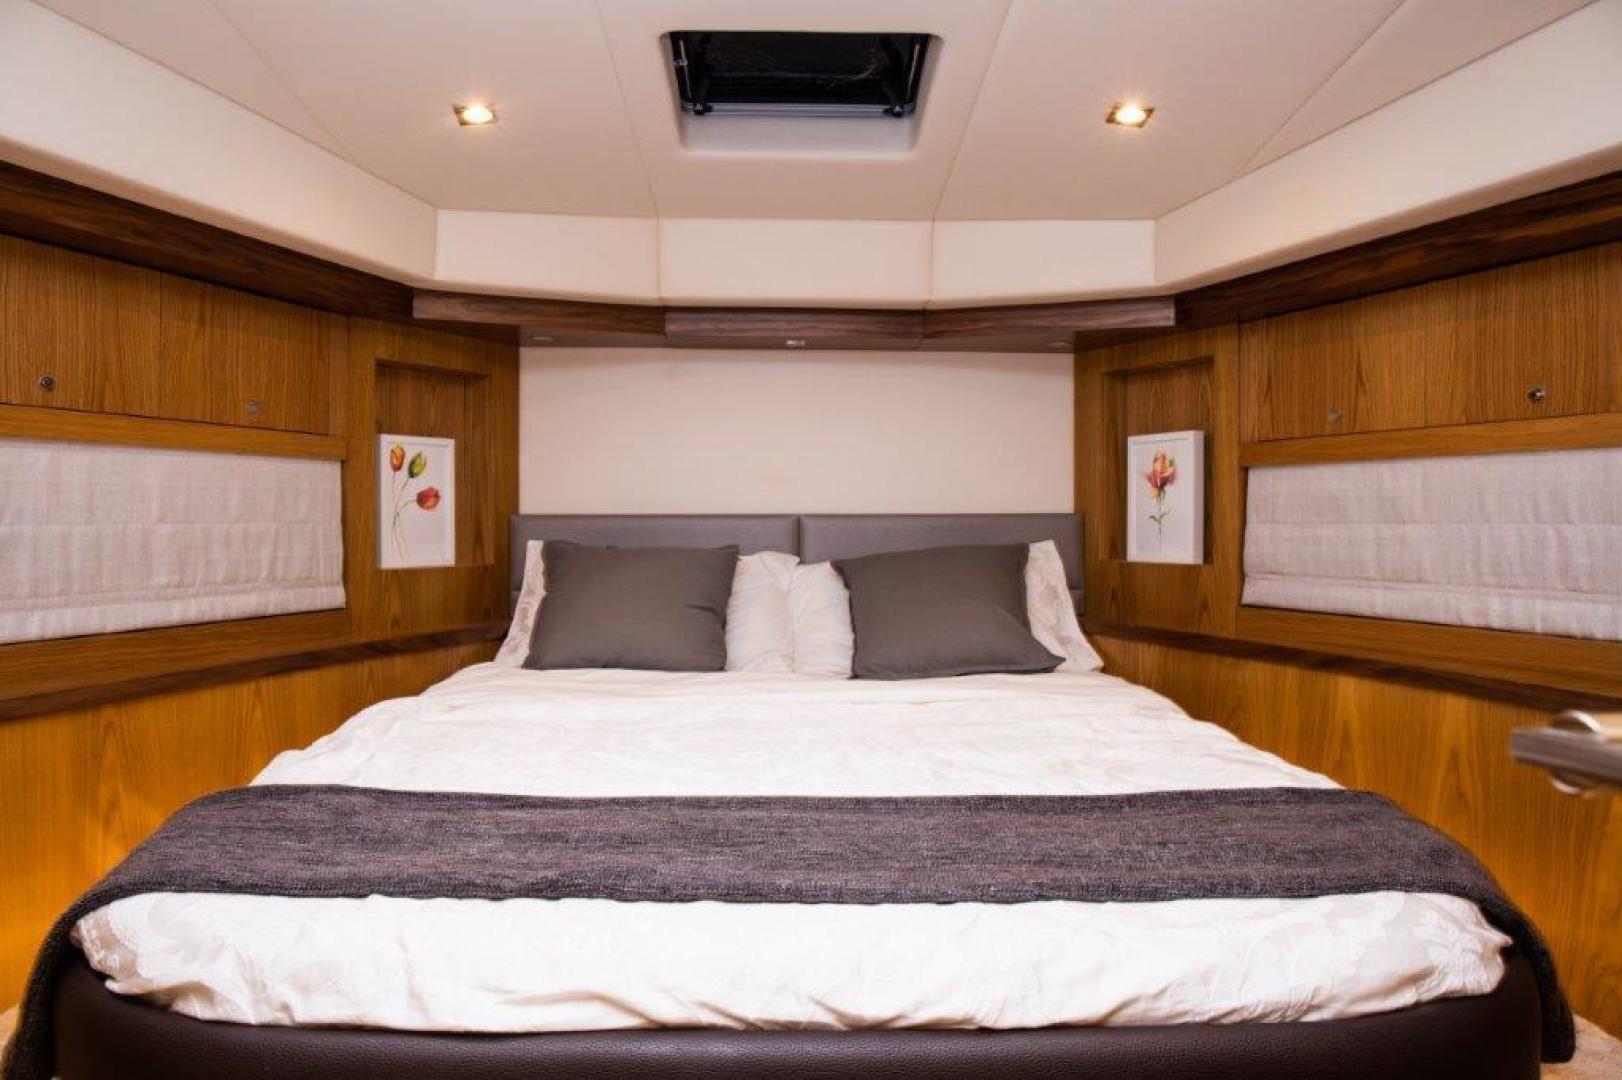 Riviera-Hull #1 2019-INTEGRITY Dubai-United Arab Emirates-VIP Stateroom-1323163 | Thumbnail